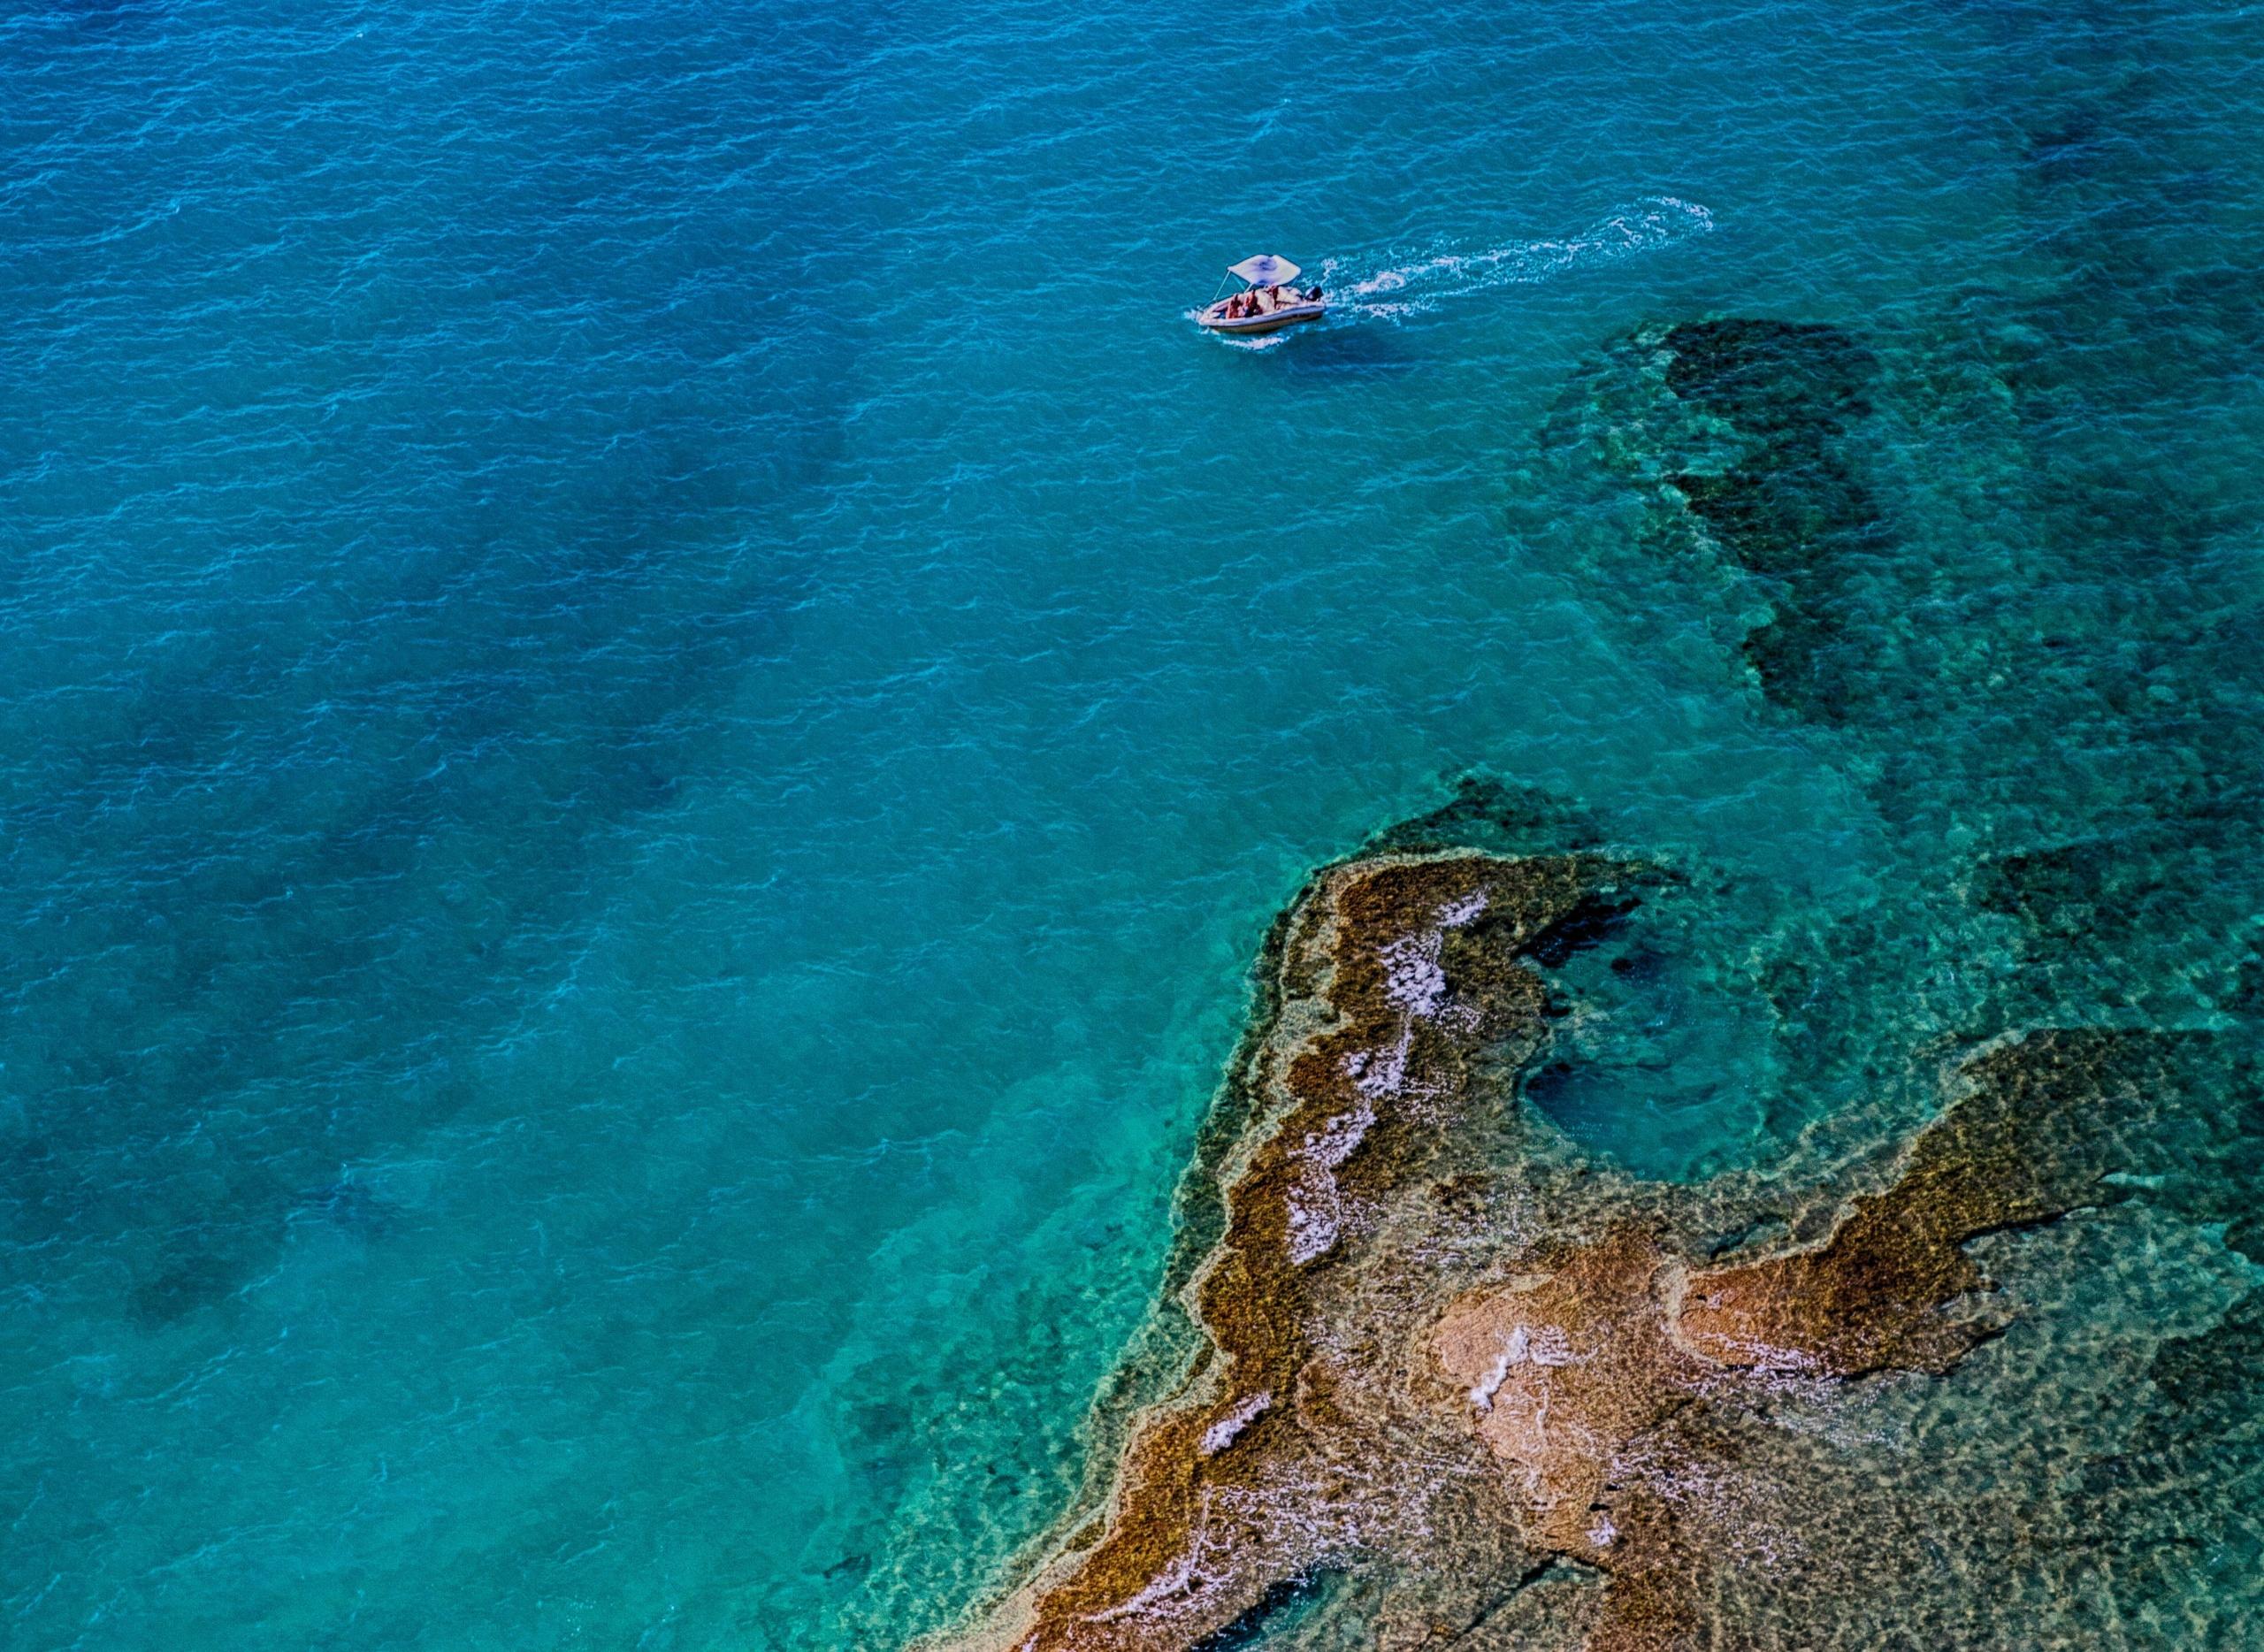 an-corfu-destination- sea ambiance - blue tirquise waters dawid-zawila-EX3n8Vsj2og-unsplash